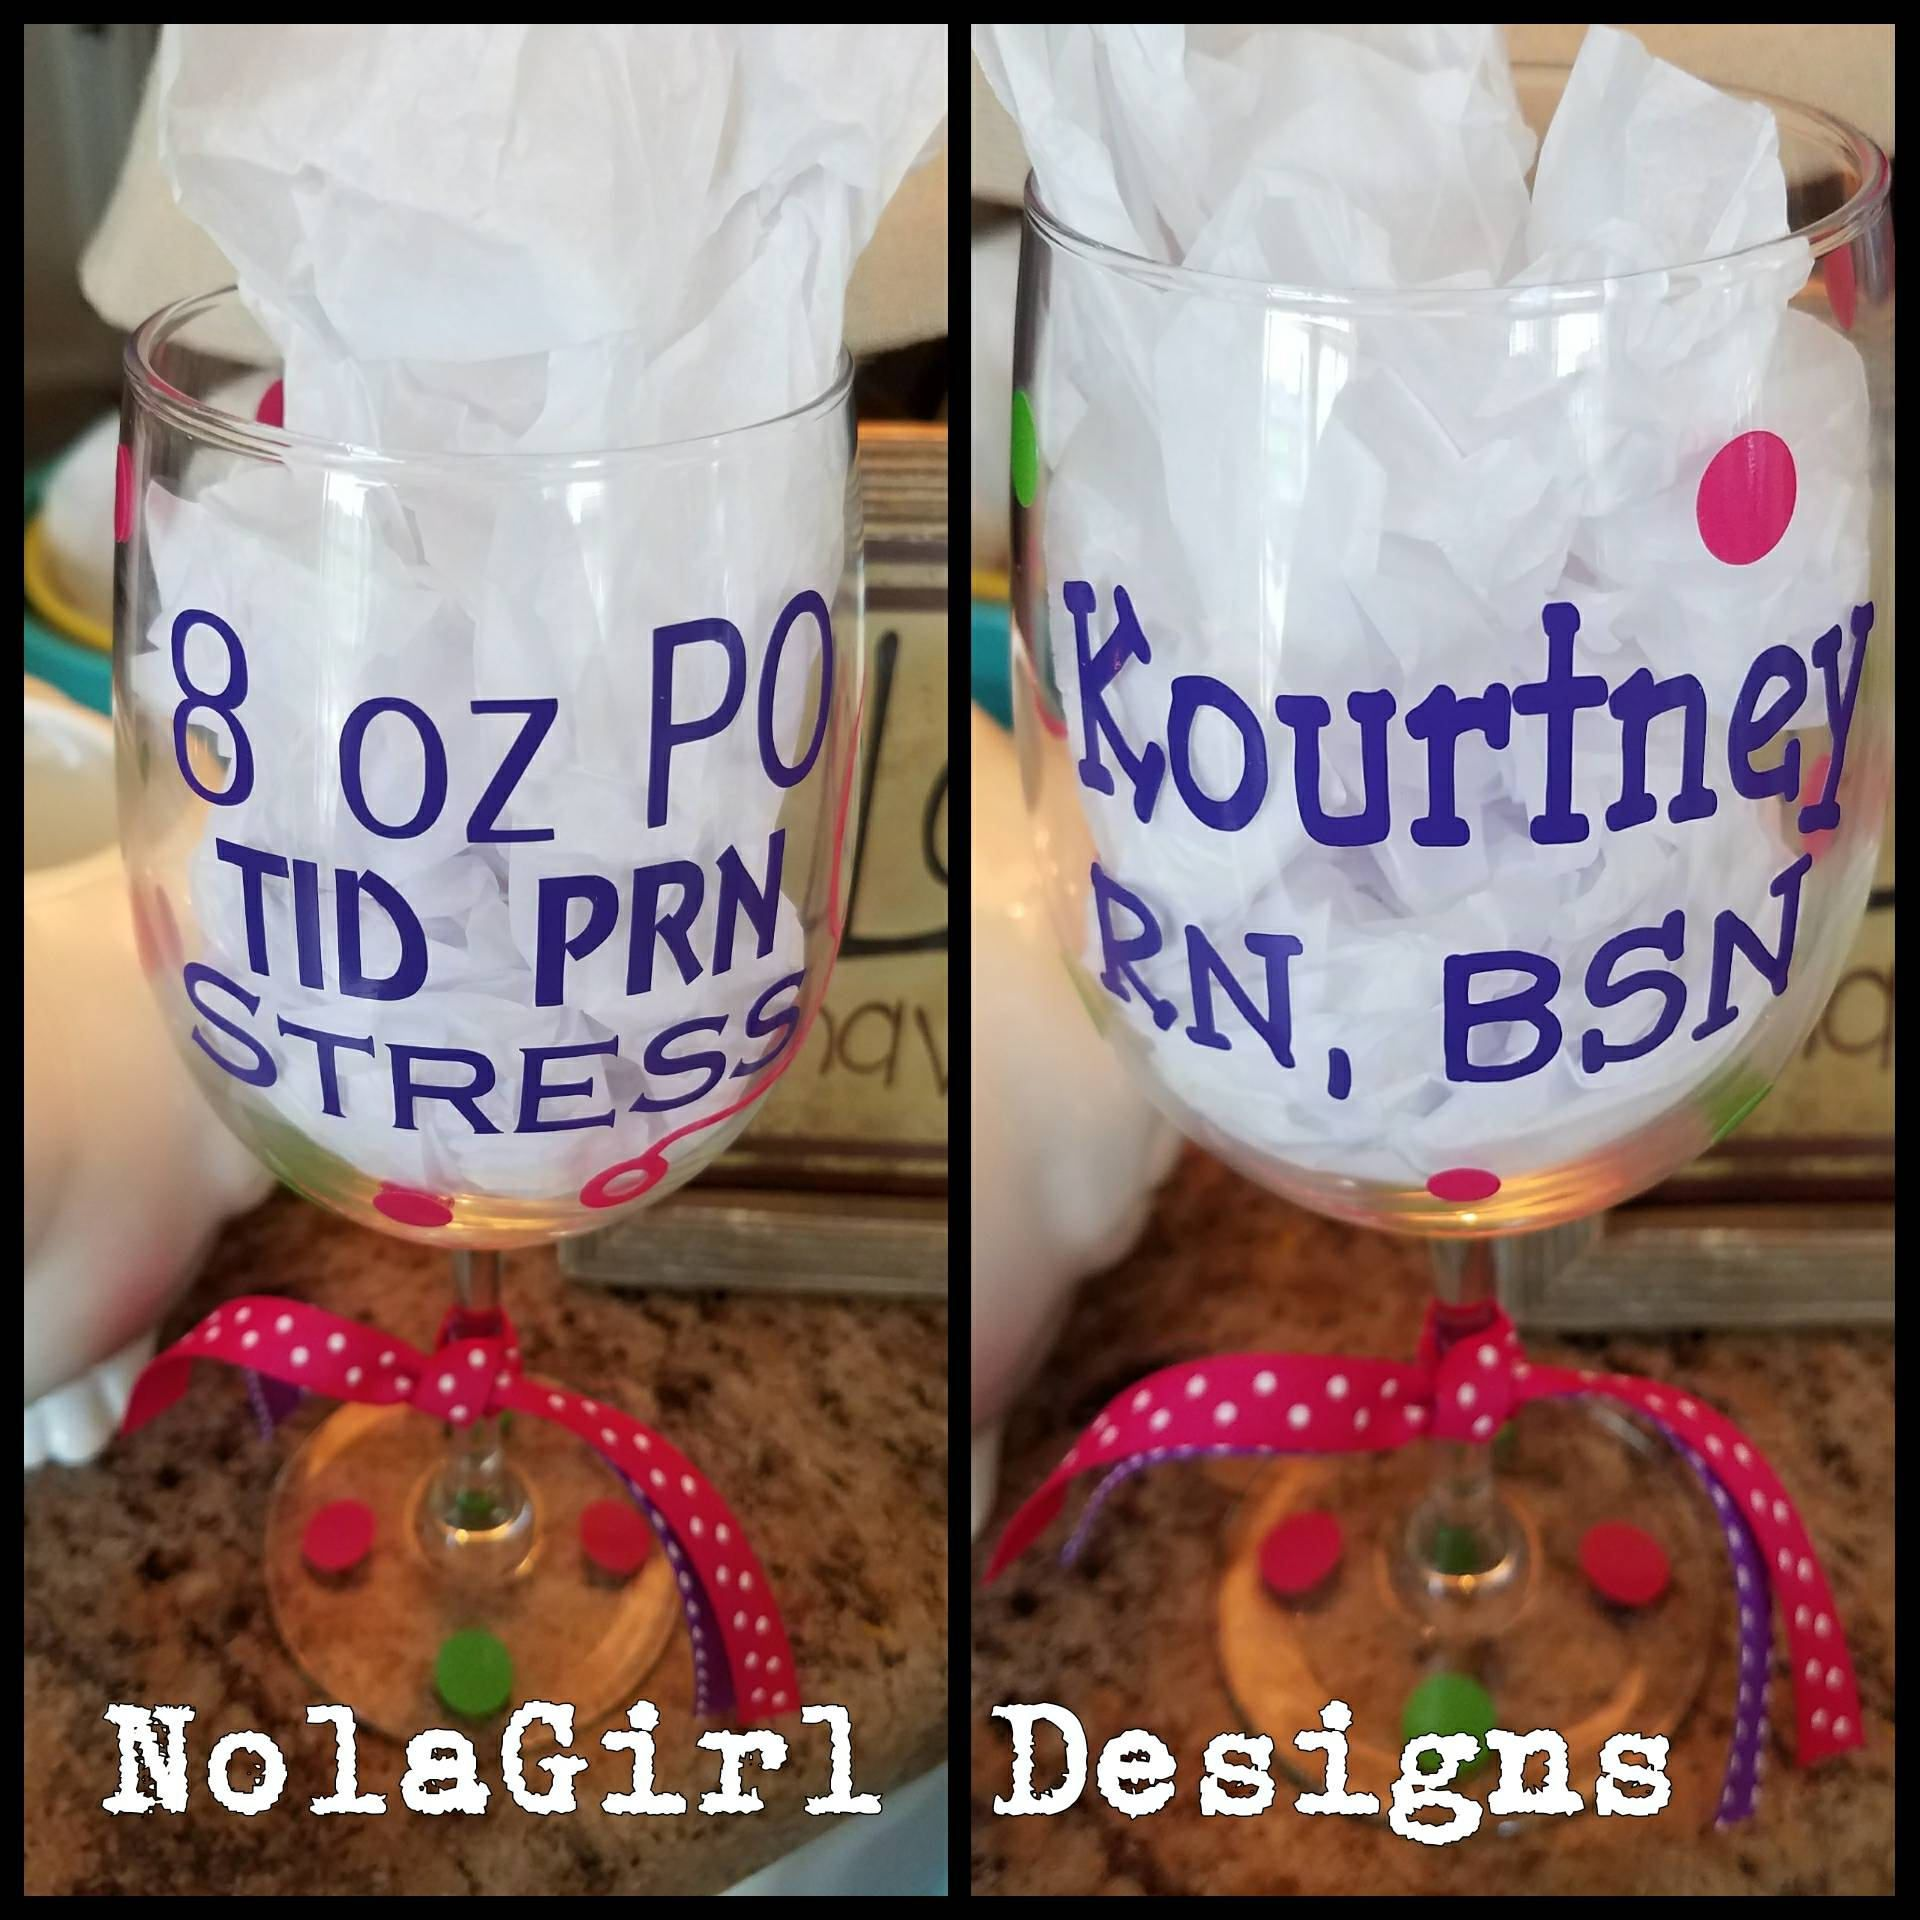 Birthday Gifts Nurses Wine Glass Nursing 8 Oz Po Tid Prn